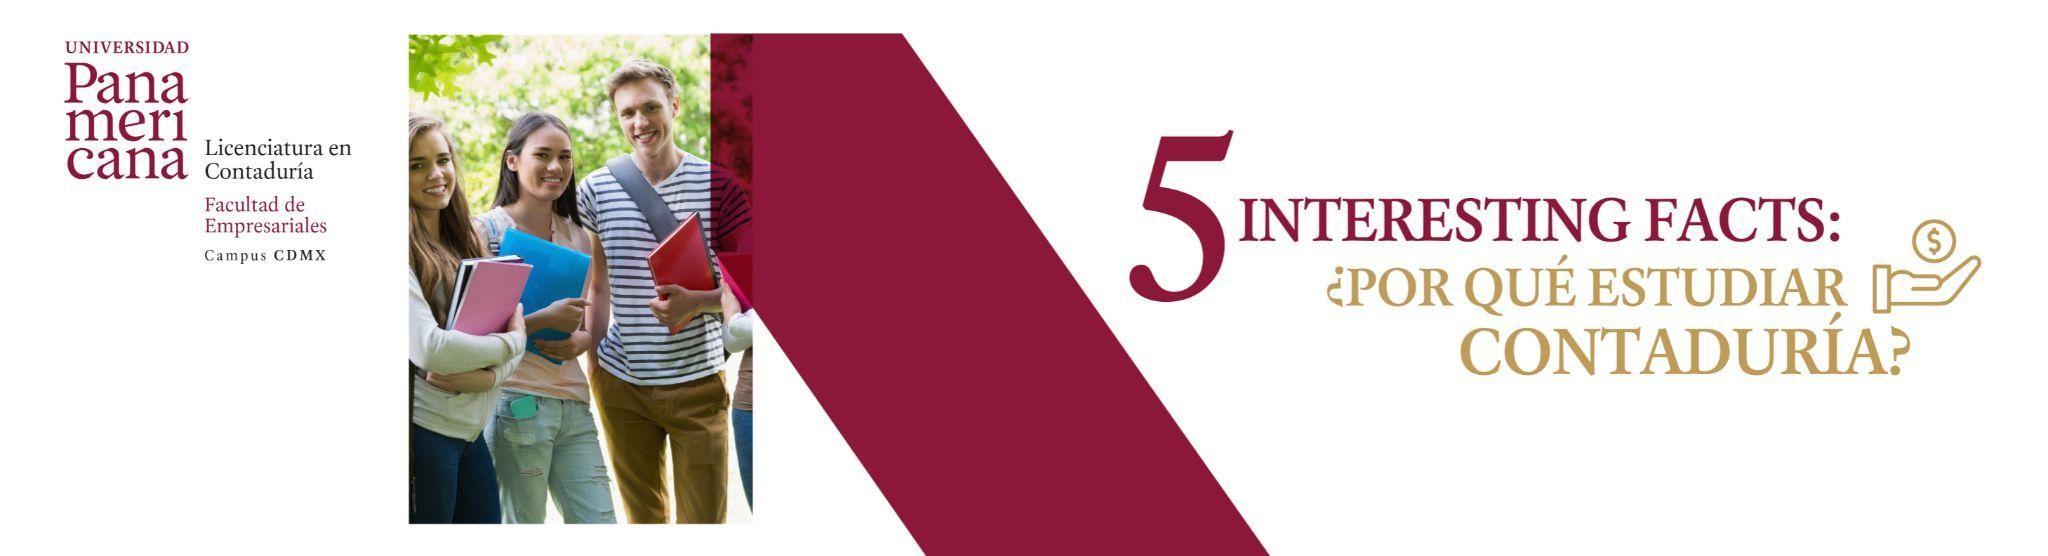 5-interesting-facts-contaduria